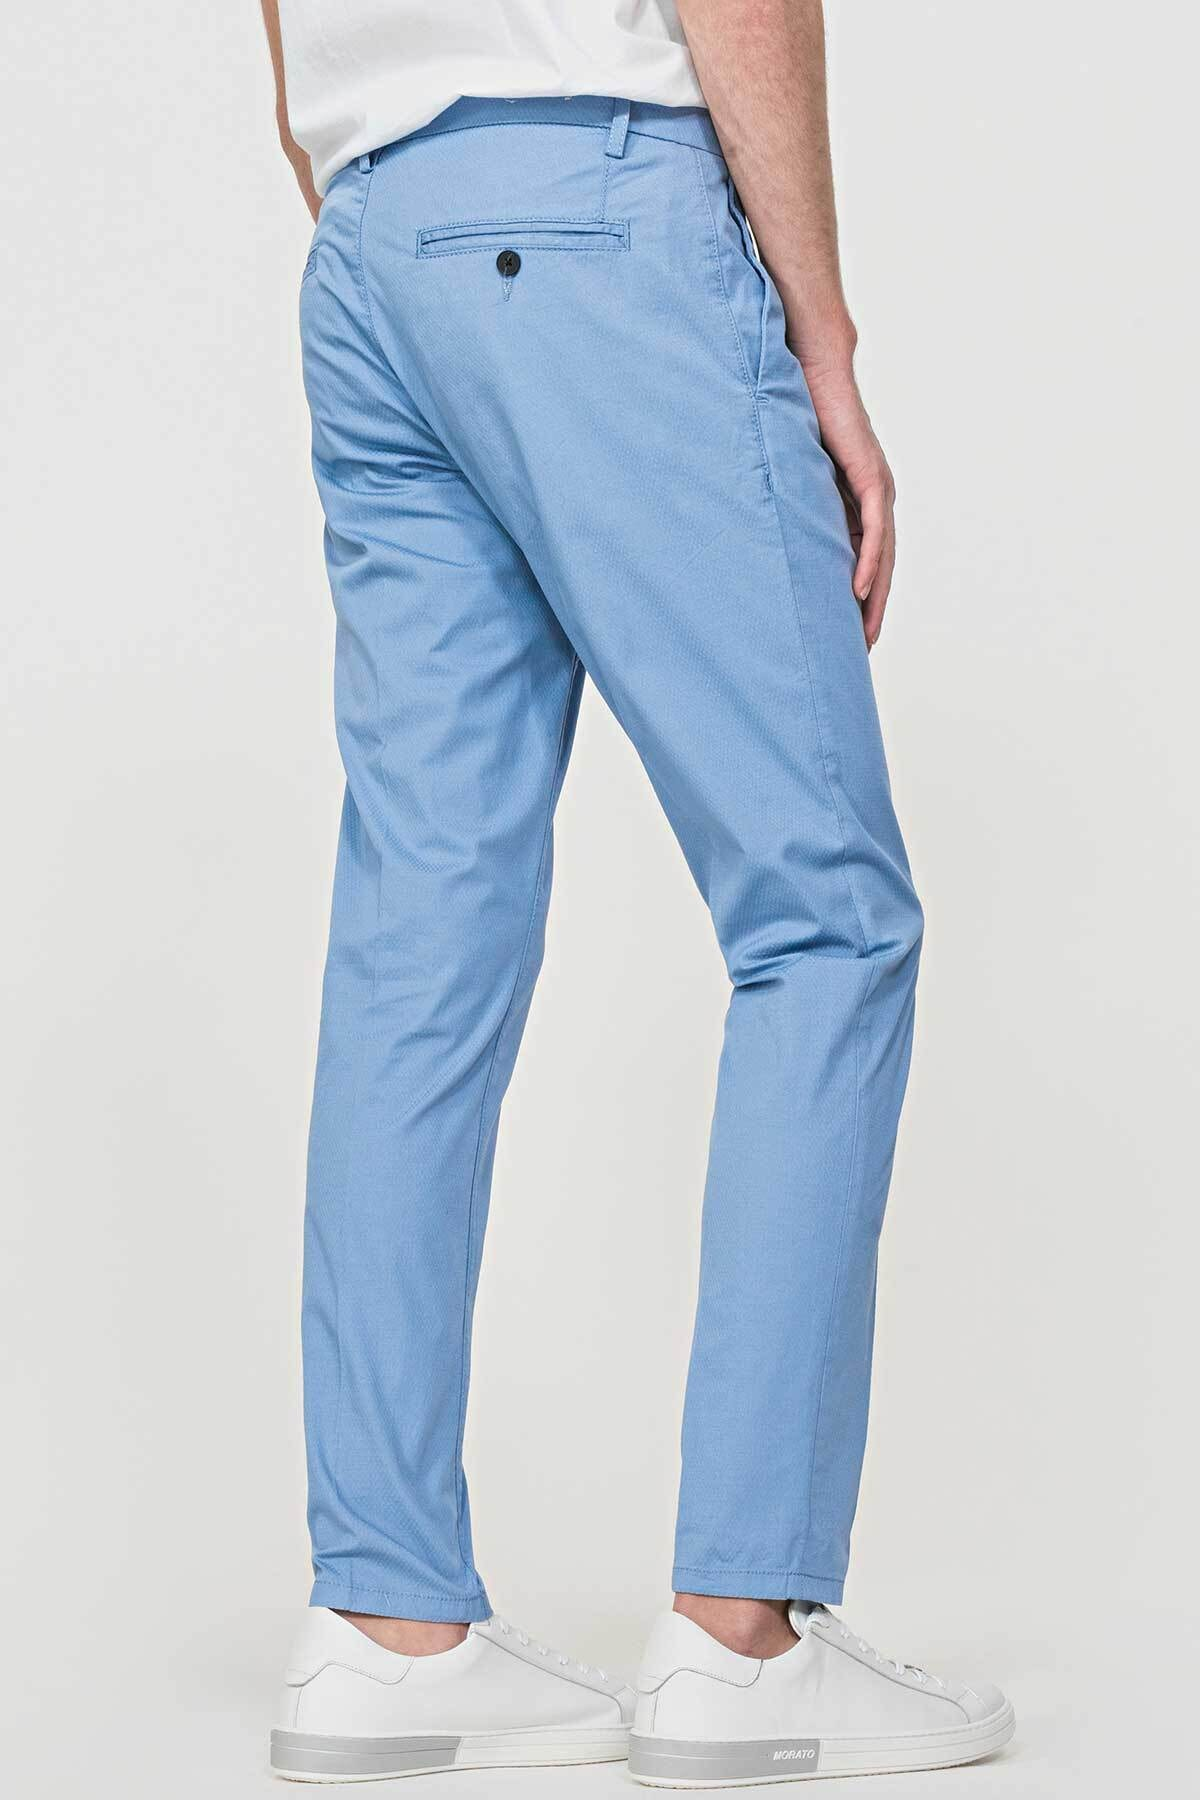 Antony Morato Bryan Skinny Fit Pantolon 2